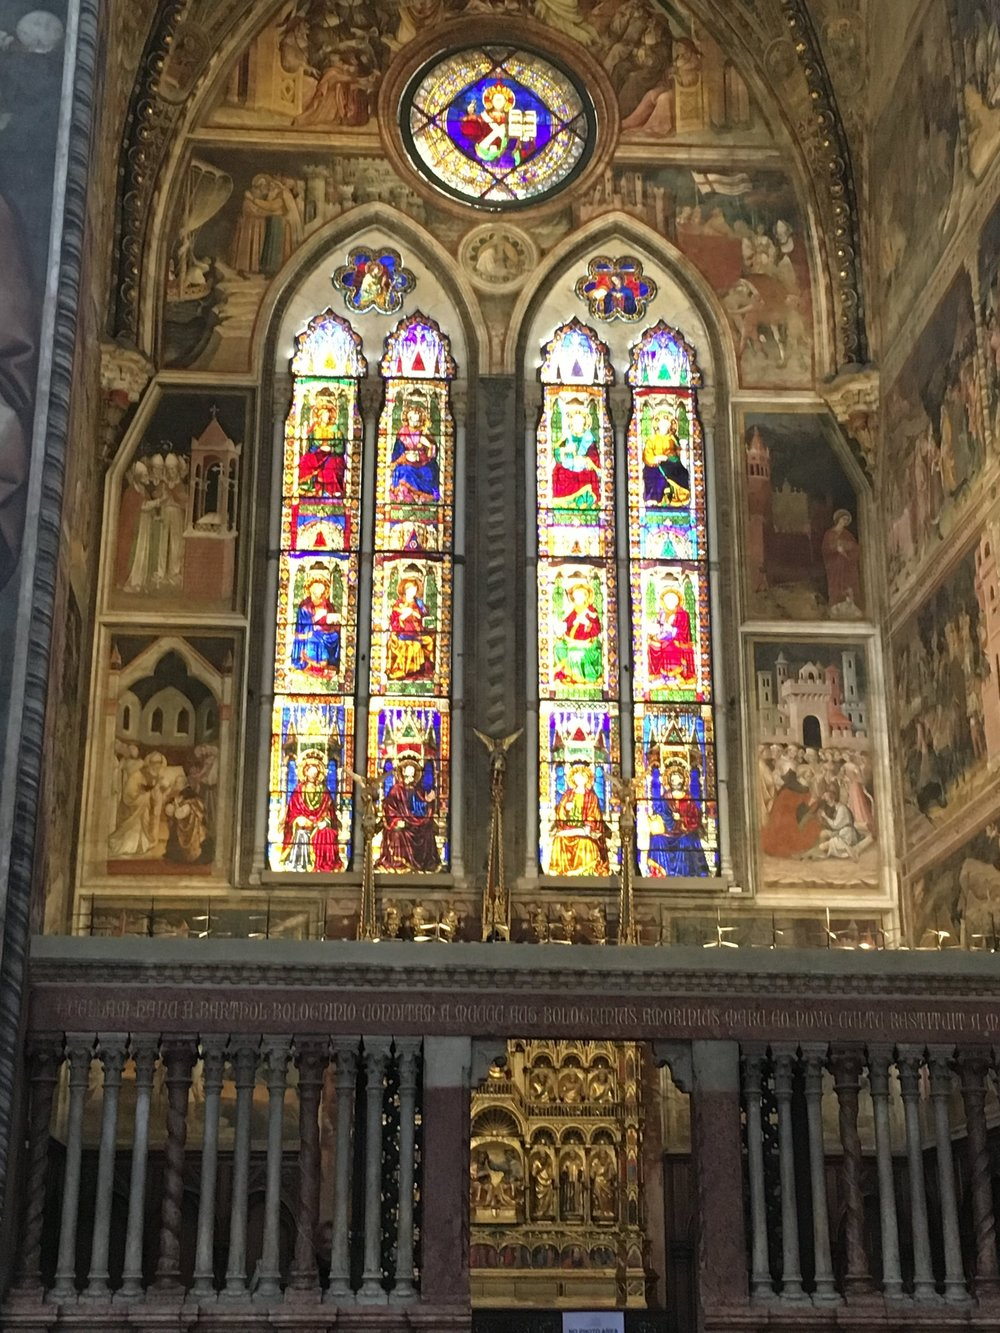 Side chapel with beautiful windows